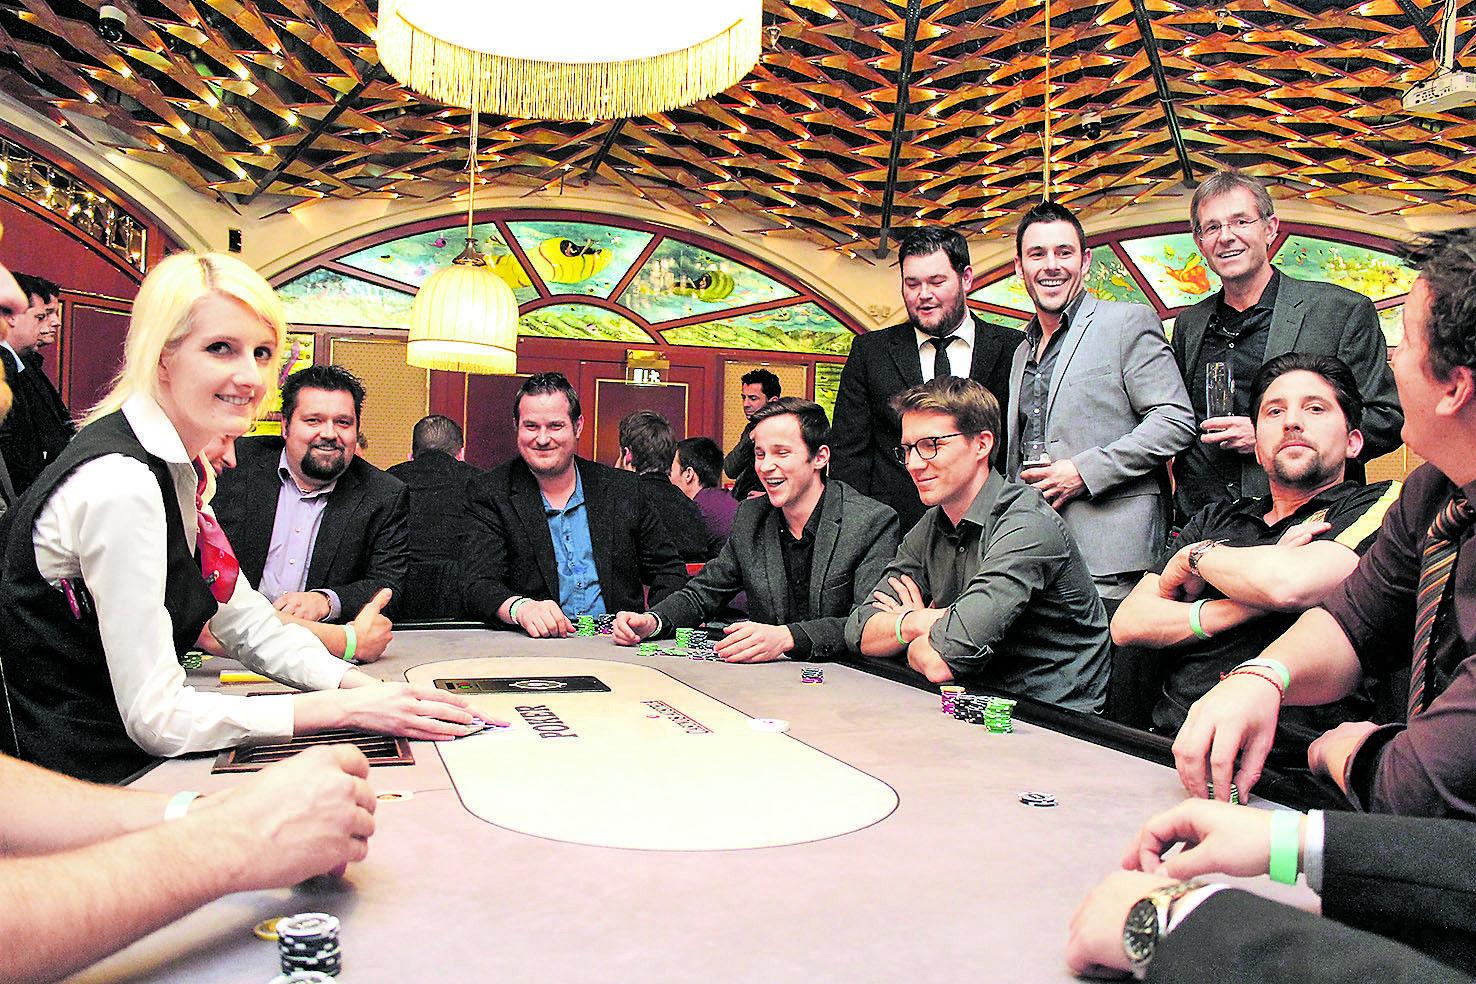 Mindestalter casino bregenz pharmacie geant casino